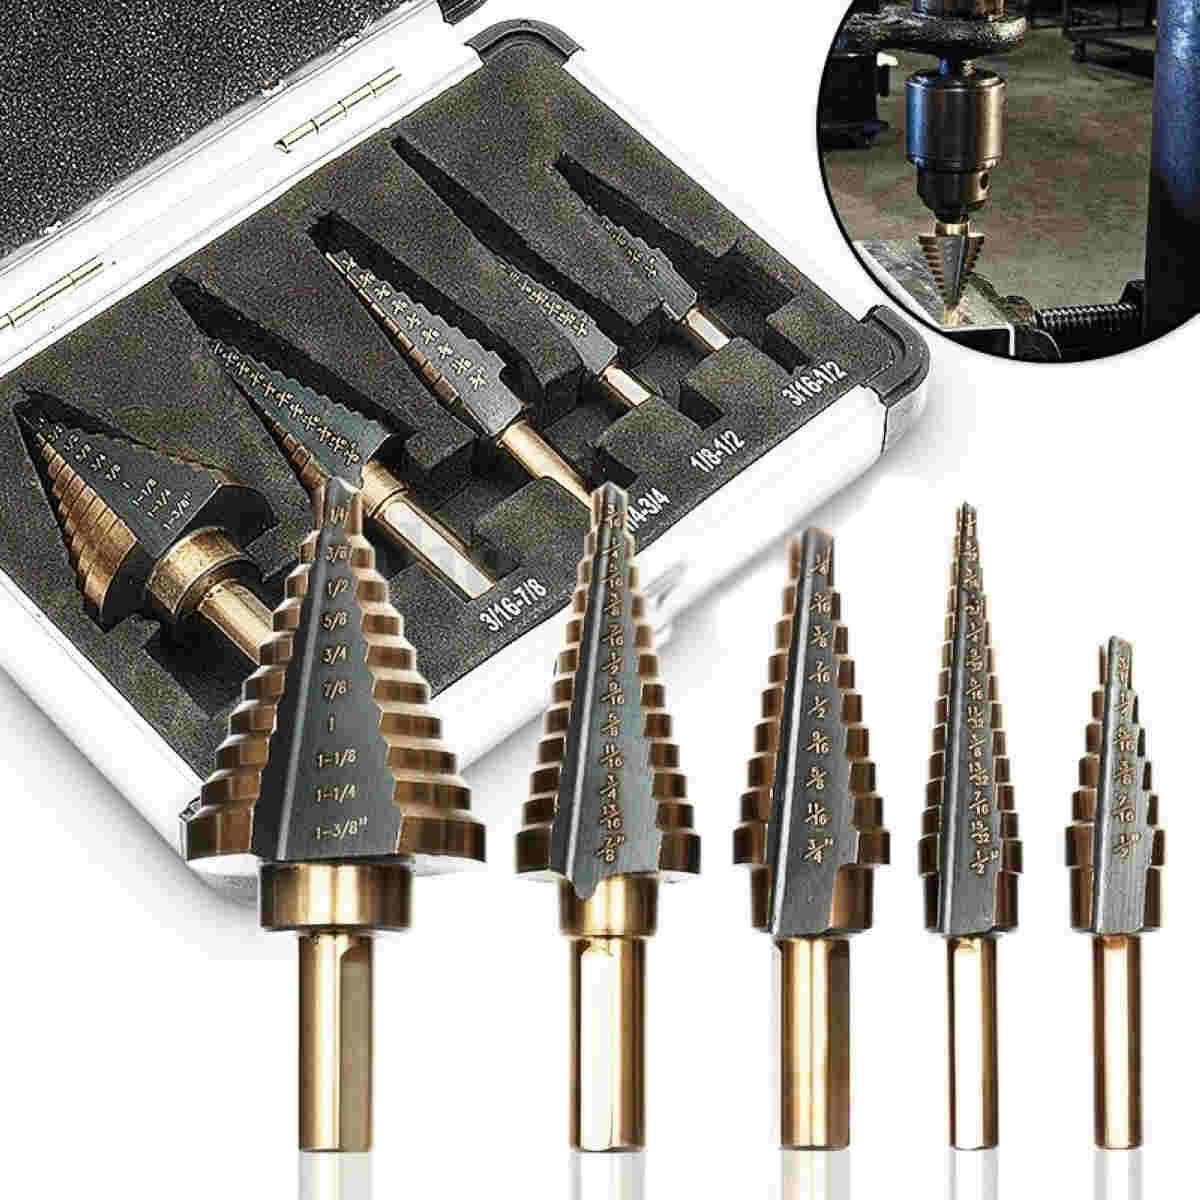 5 Pcs HSS Large Cobalt Hole Titanium Cone Step Drill Bit Tools With Case